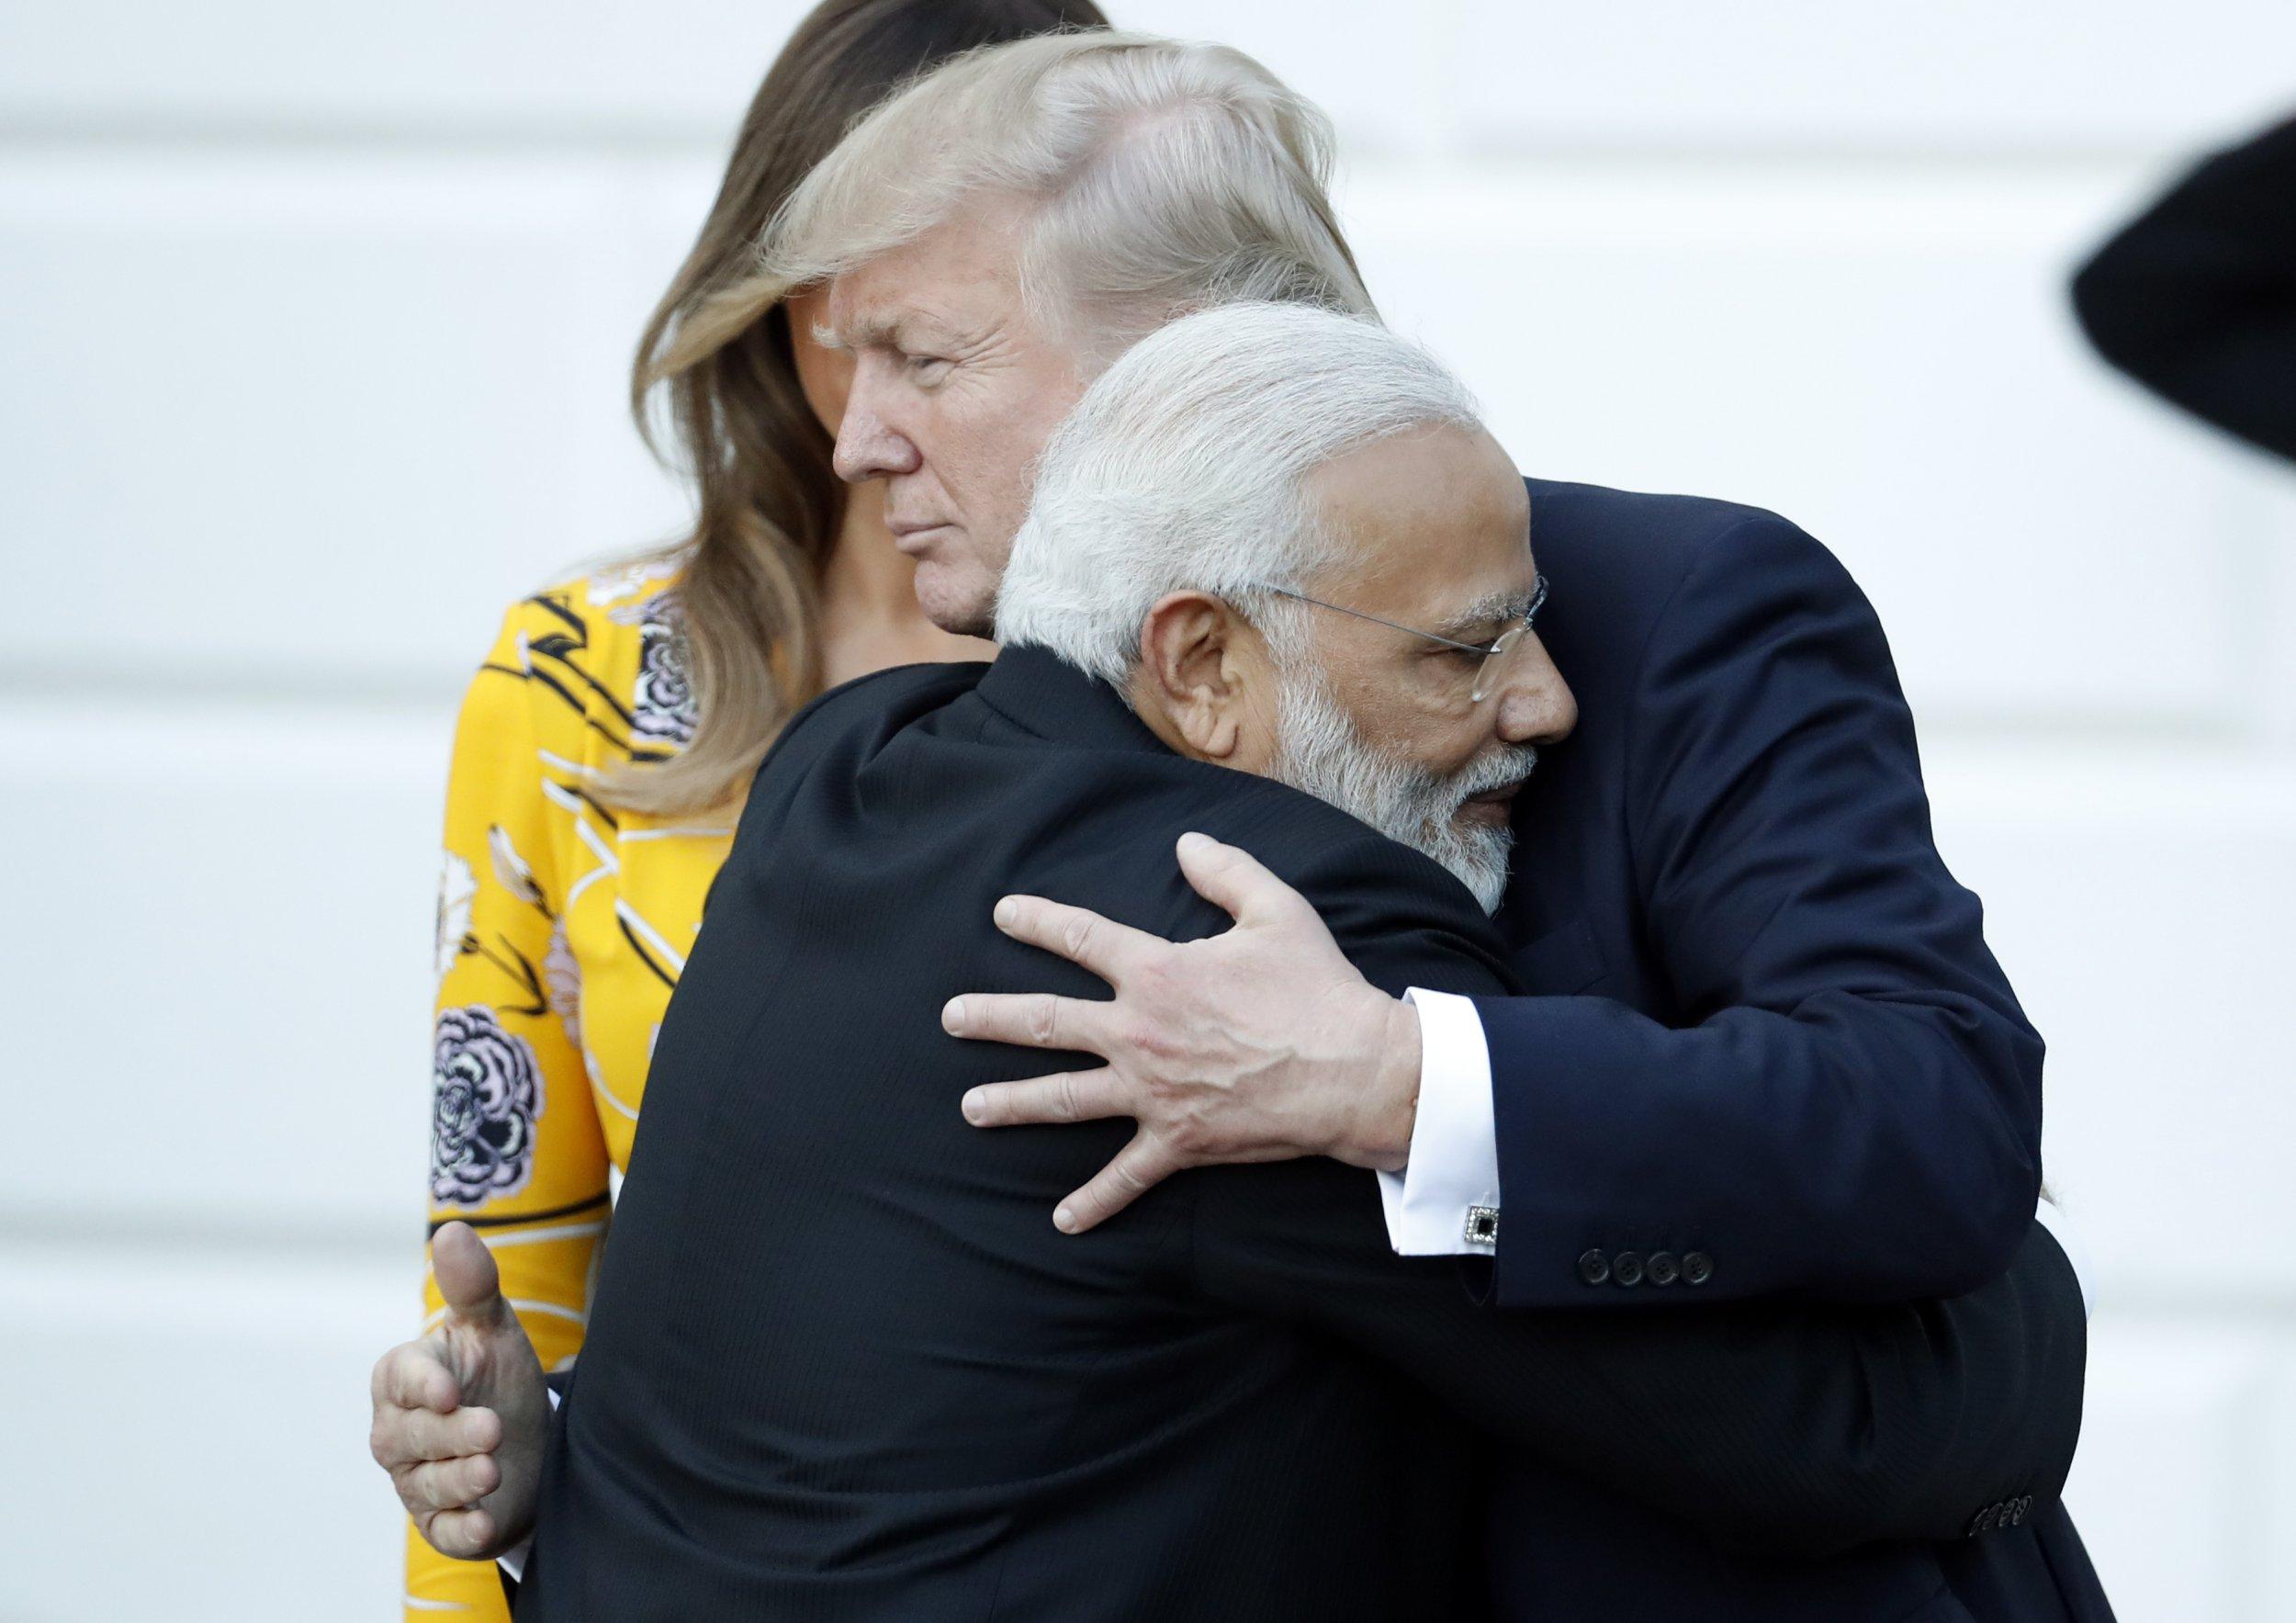 Indian Prime Minister Narendra Modi hugs President Donald Trump, with first lady Melania Trump behind, as Modi departs the White House, Monday, June 26, 2017, in Washington. (AP Photo/Alex Brandon)